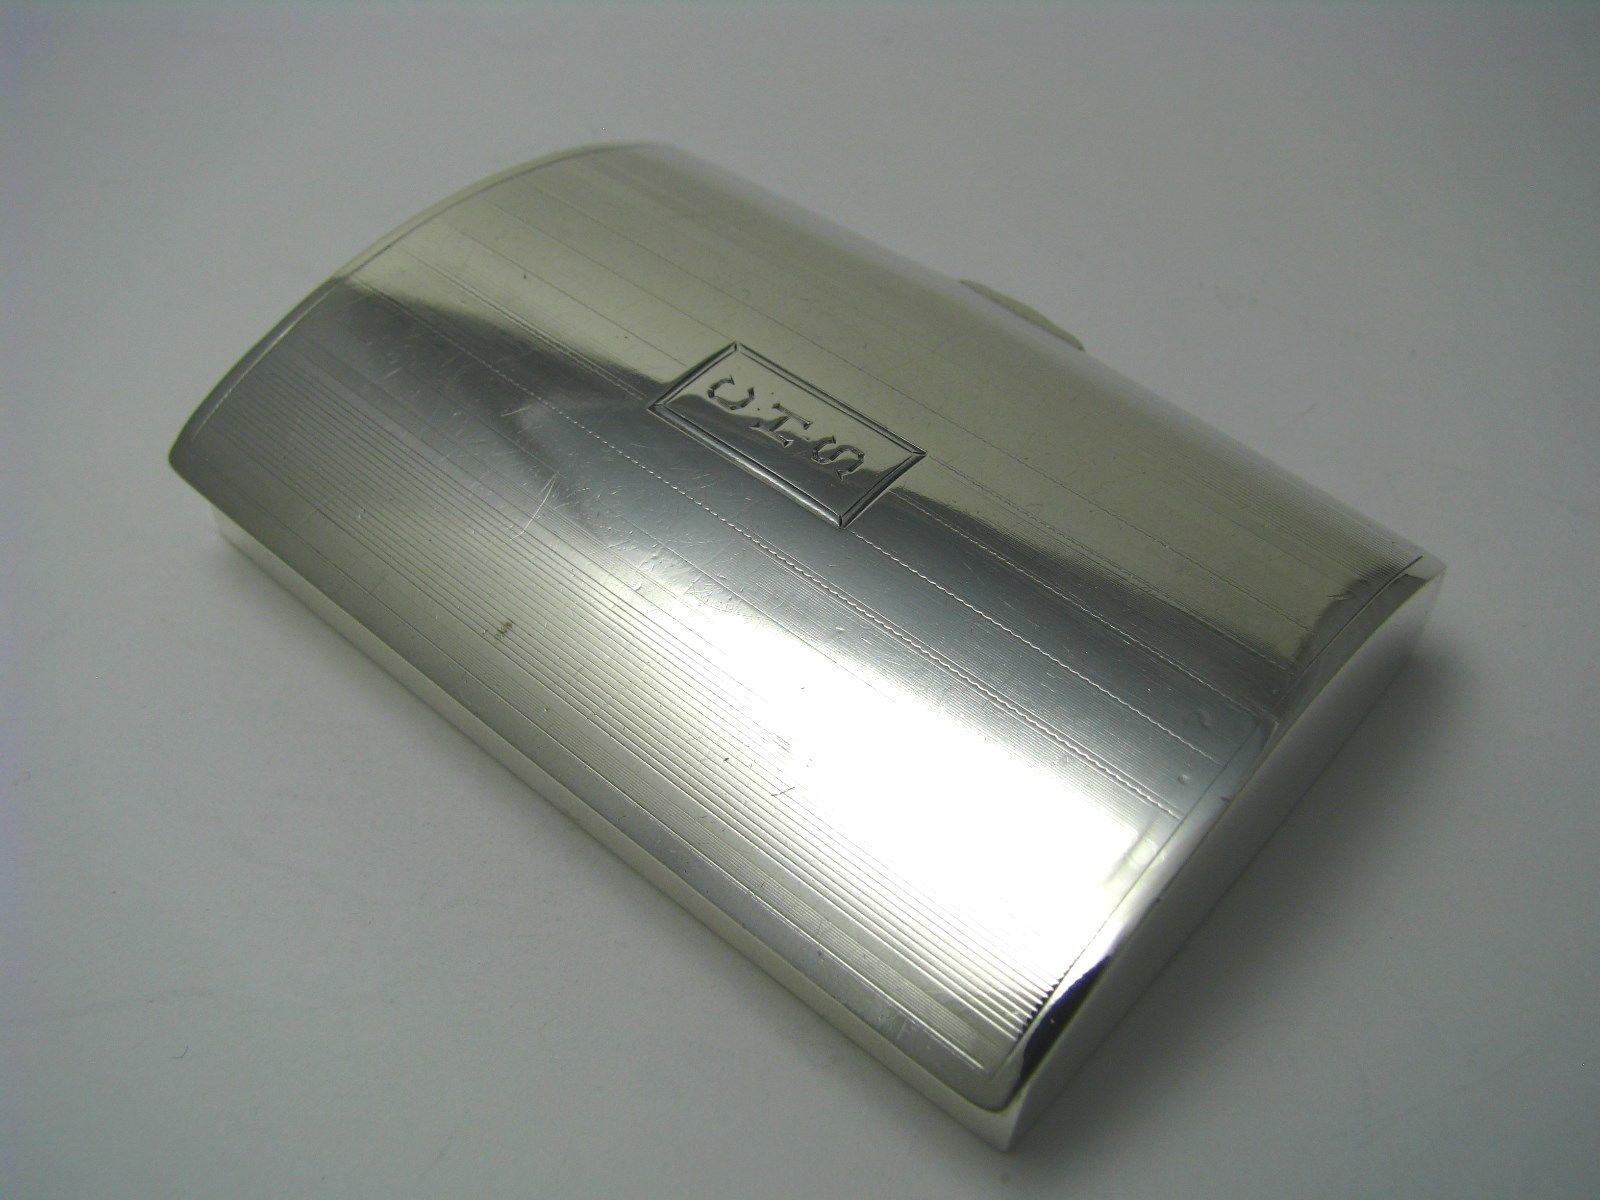 STERLING SILVER SNUFFBOX SNUFF PILL BOX International / Watrous Ca1930s Mono CHS - $275.00